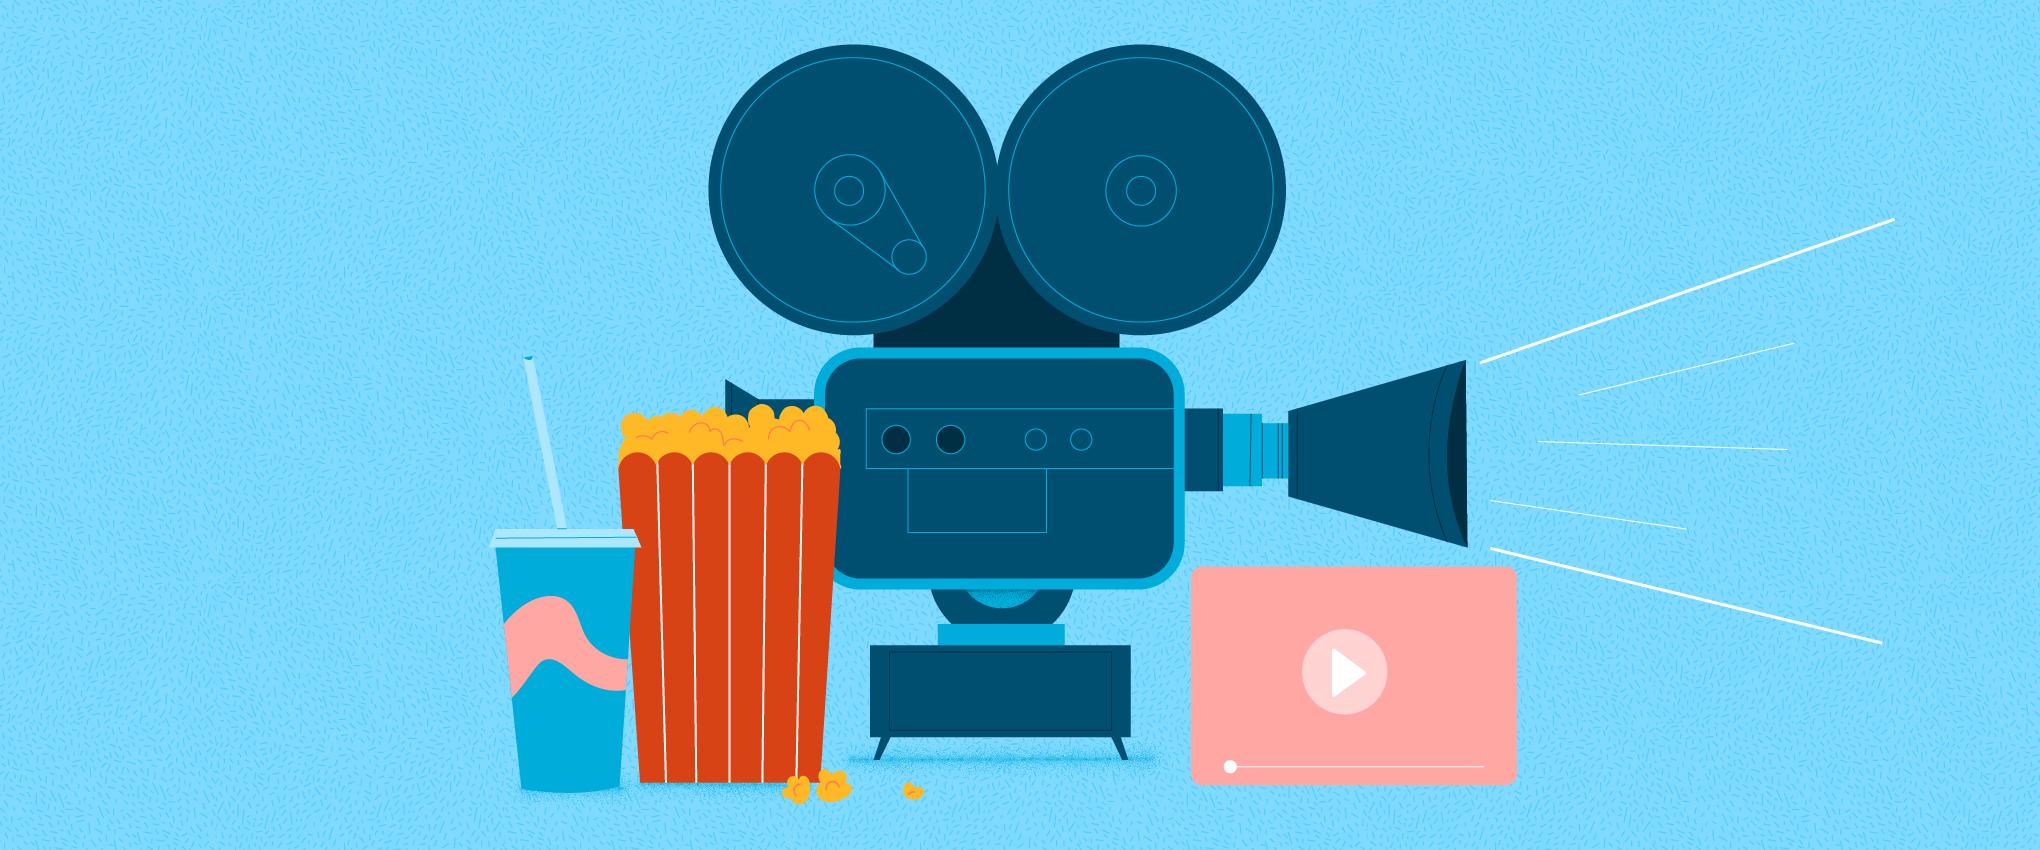 Movies, videos & TV shows